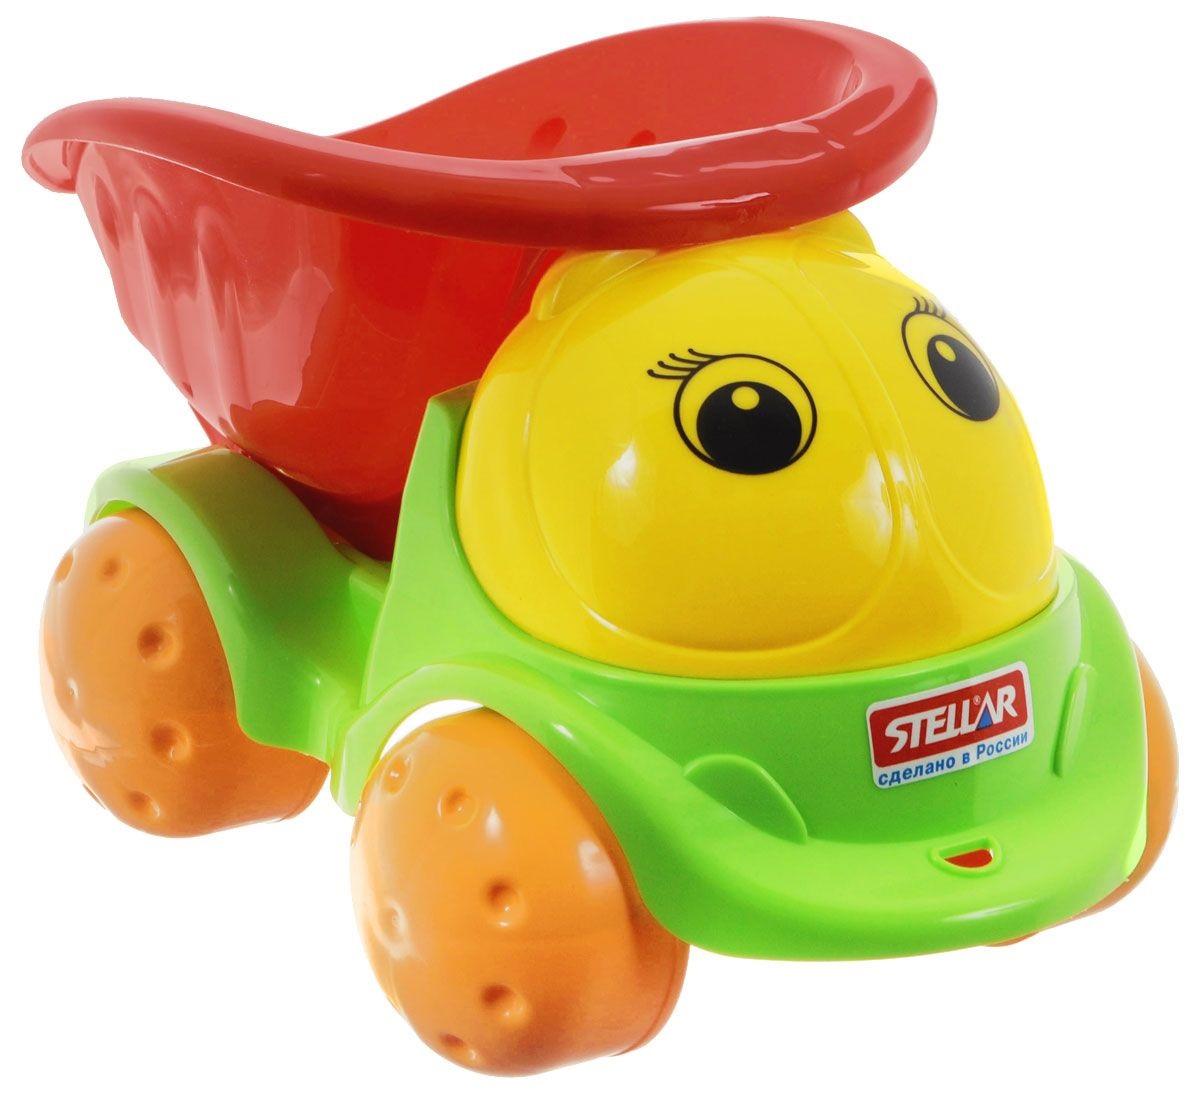 Грузовик «Пчёлка»Машинки для малышей<br>Грузовик «Пчёлка»<br>